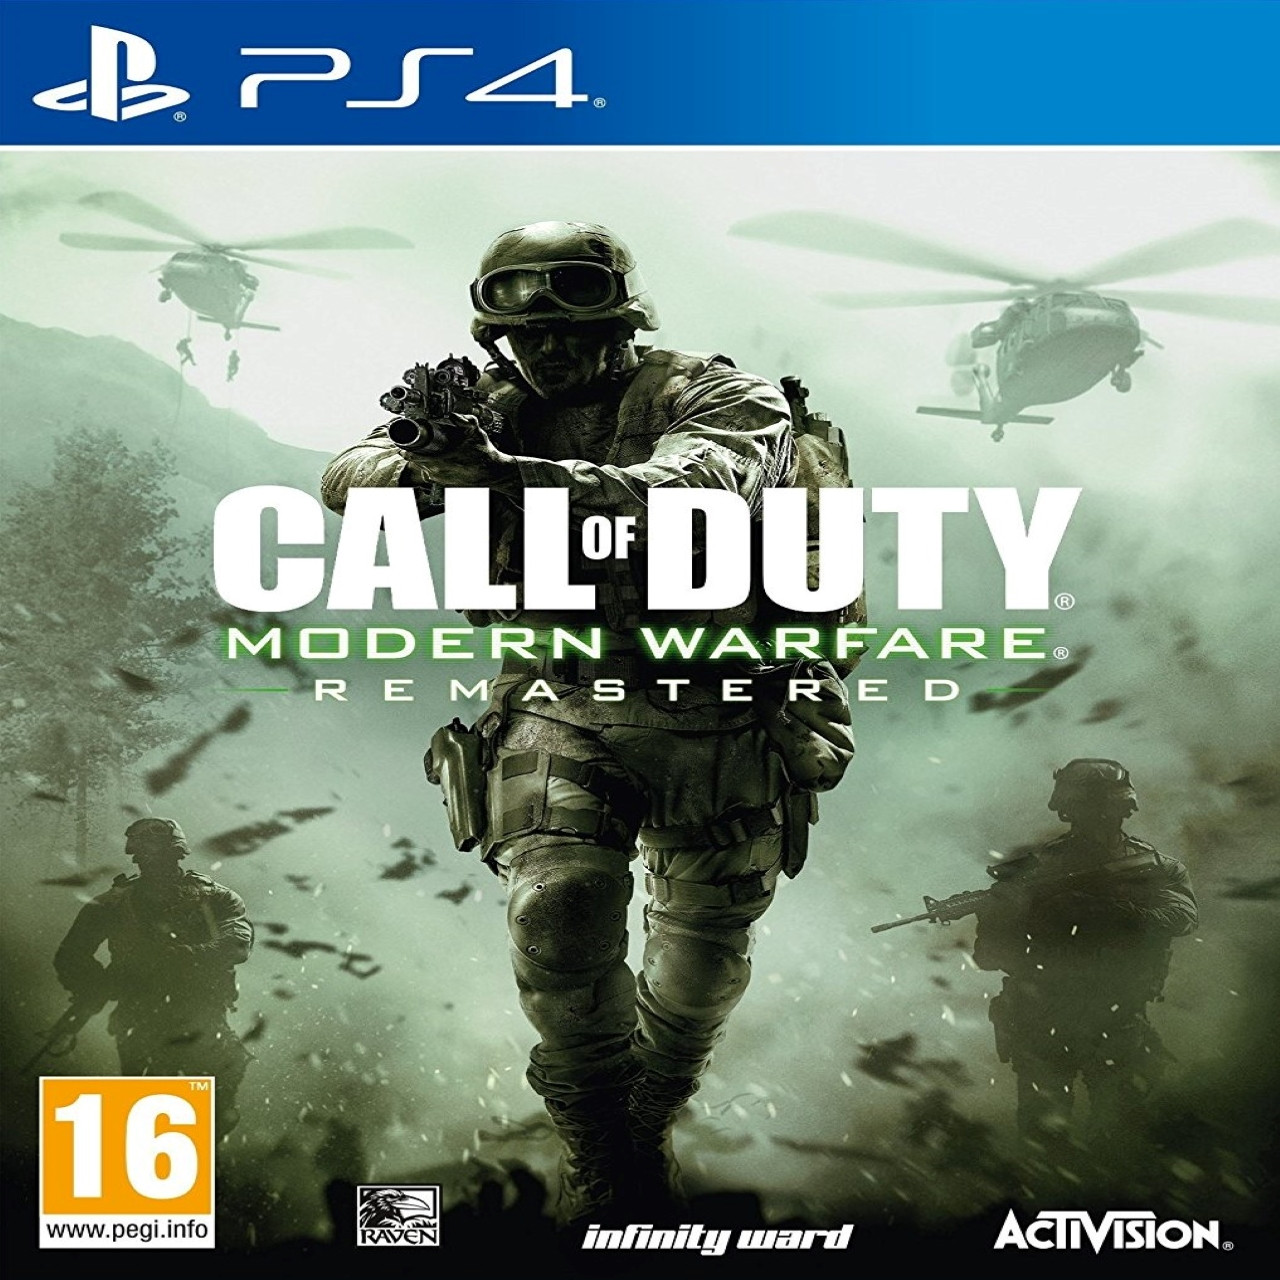 Call of Duty: Modern Warfare Remastered ENG PS4 (Б/В)